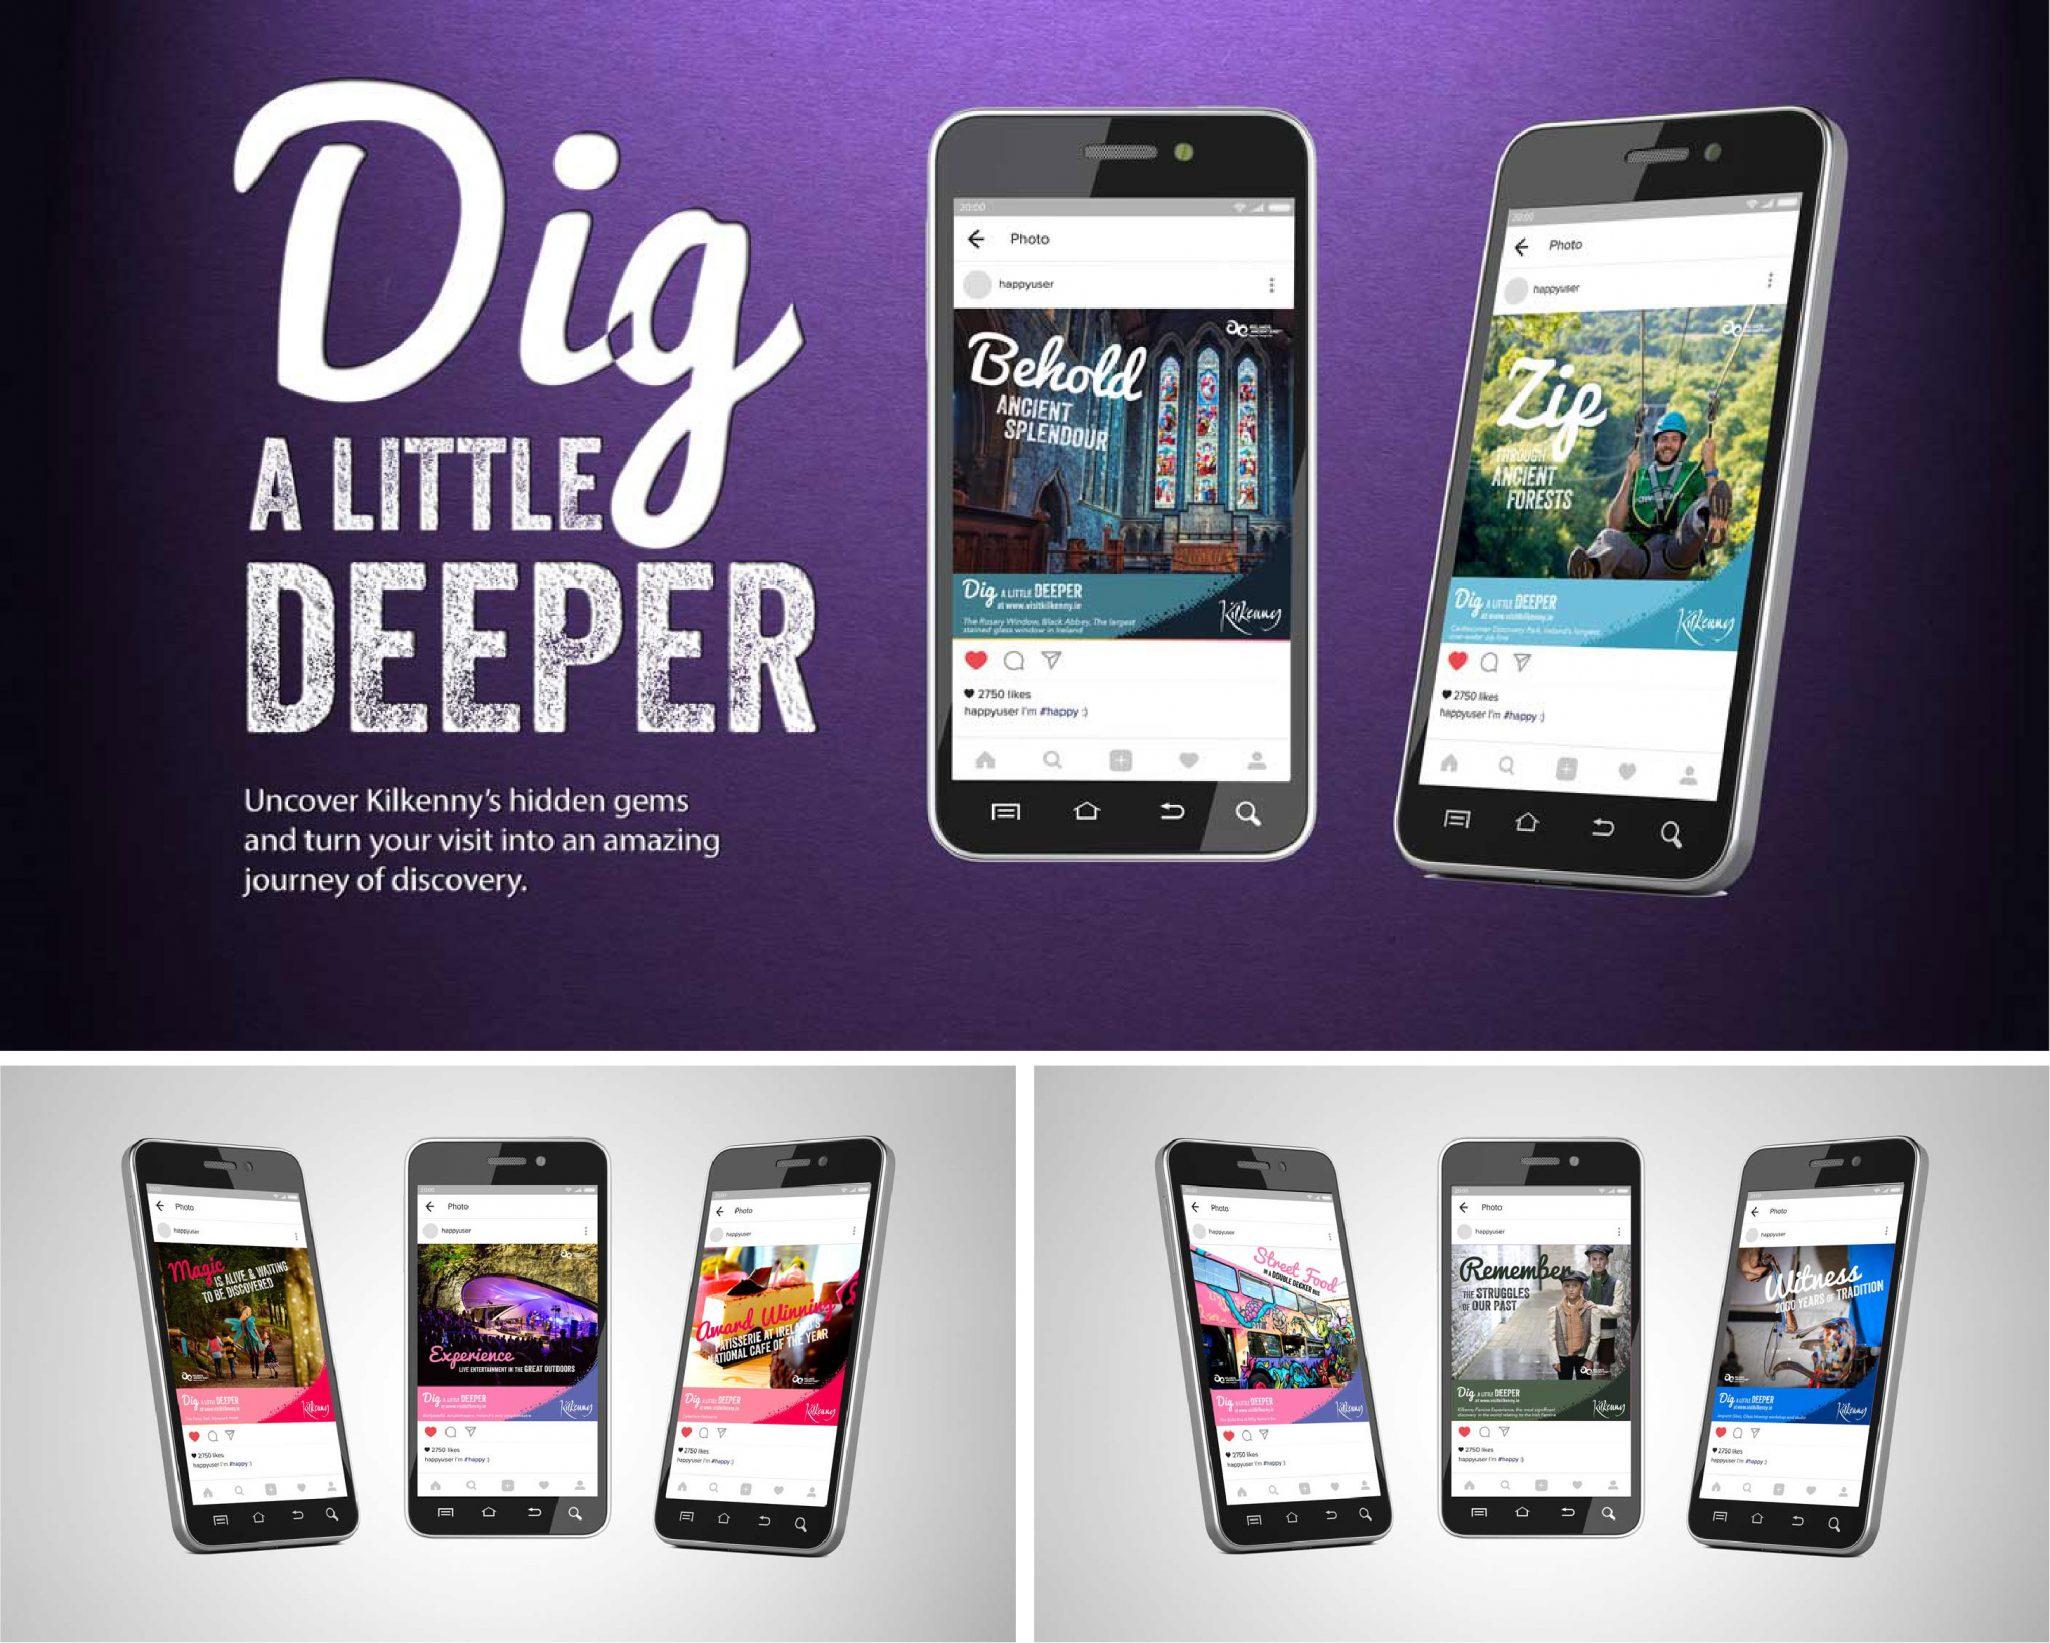 Digdeeper Phone All 01